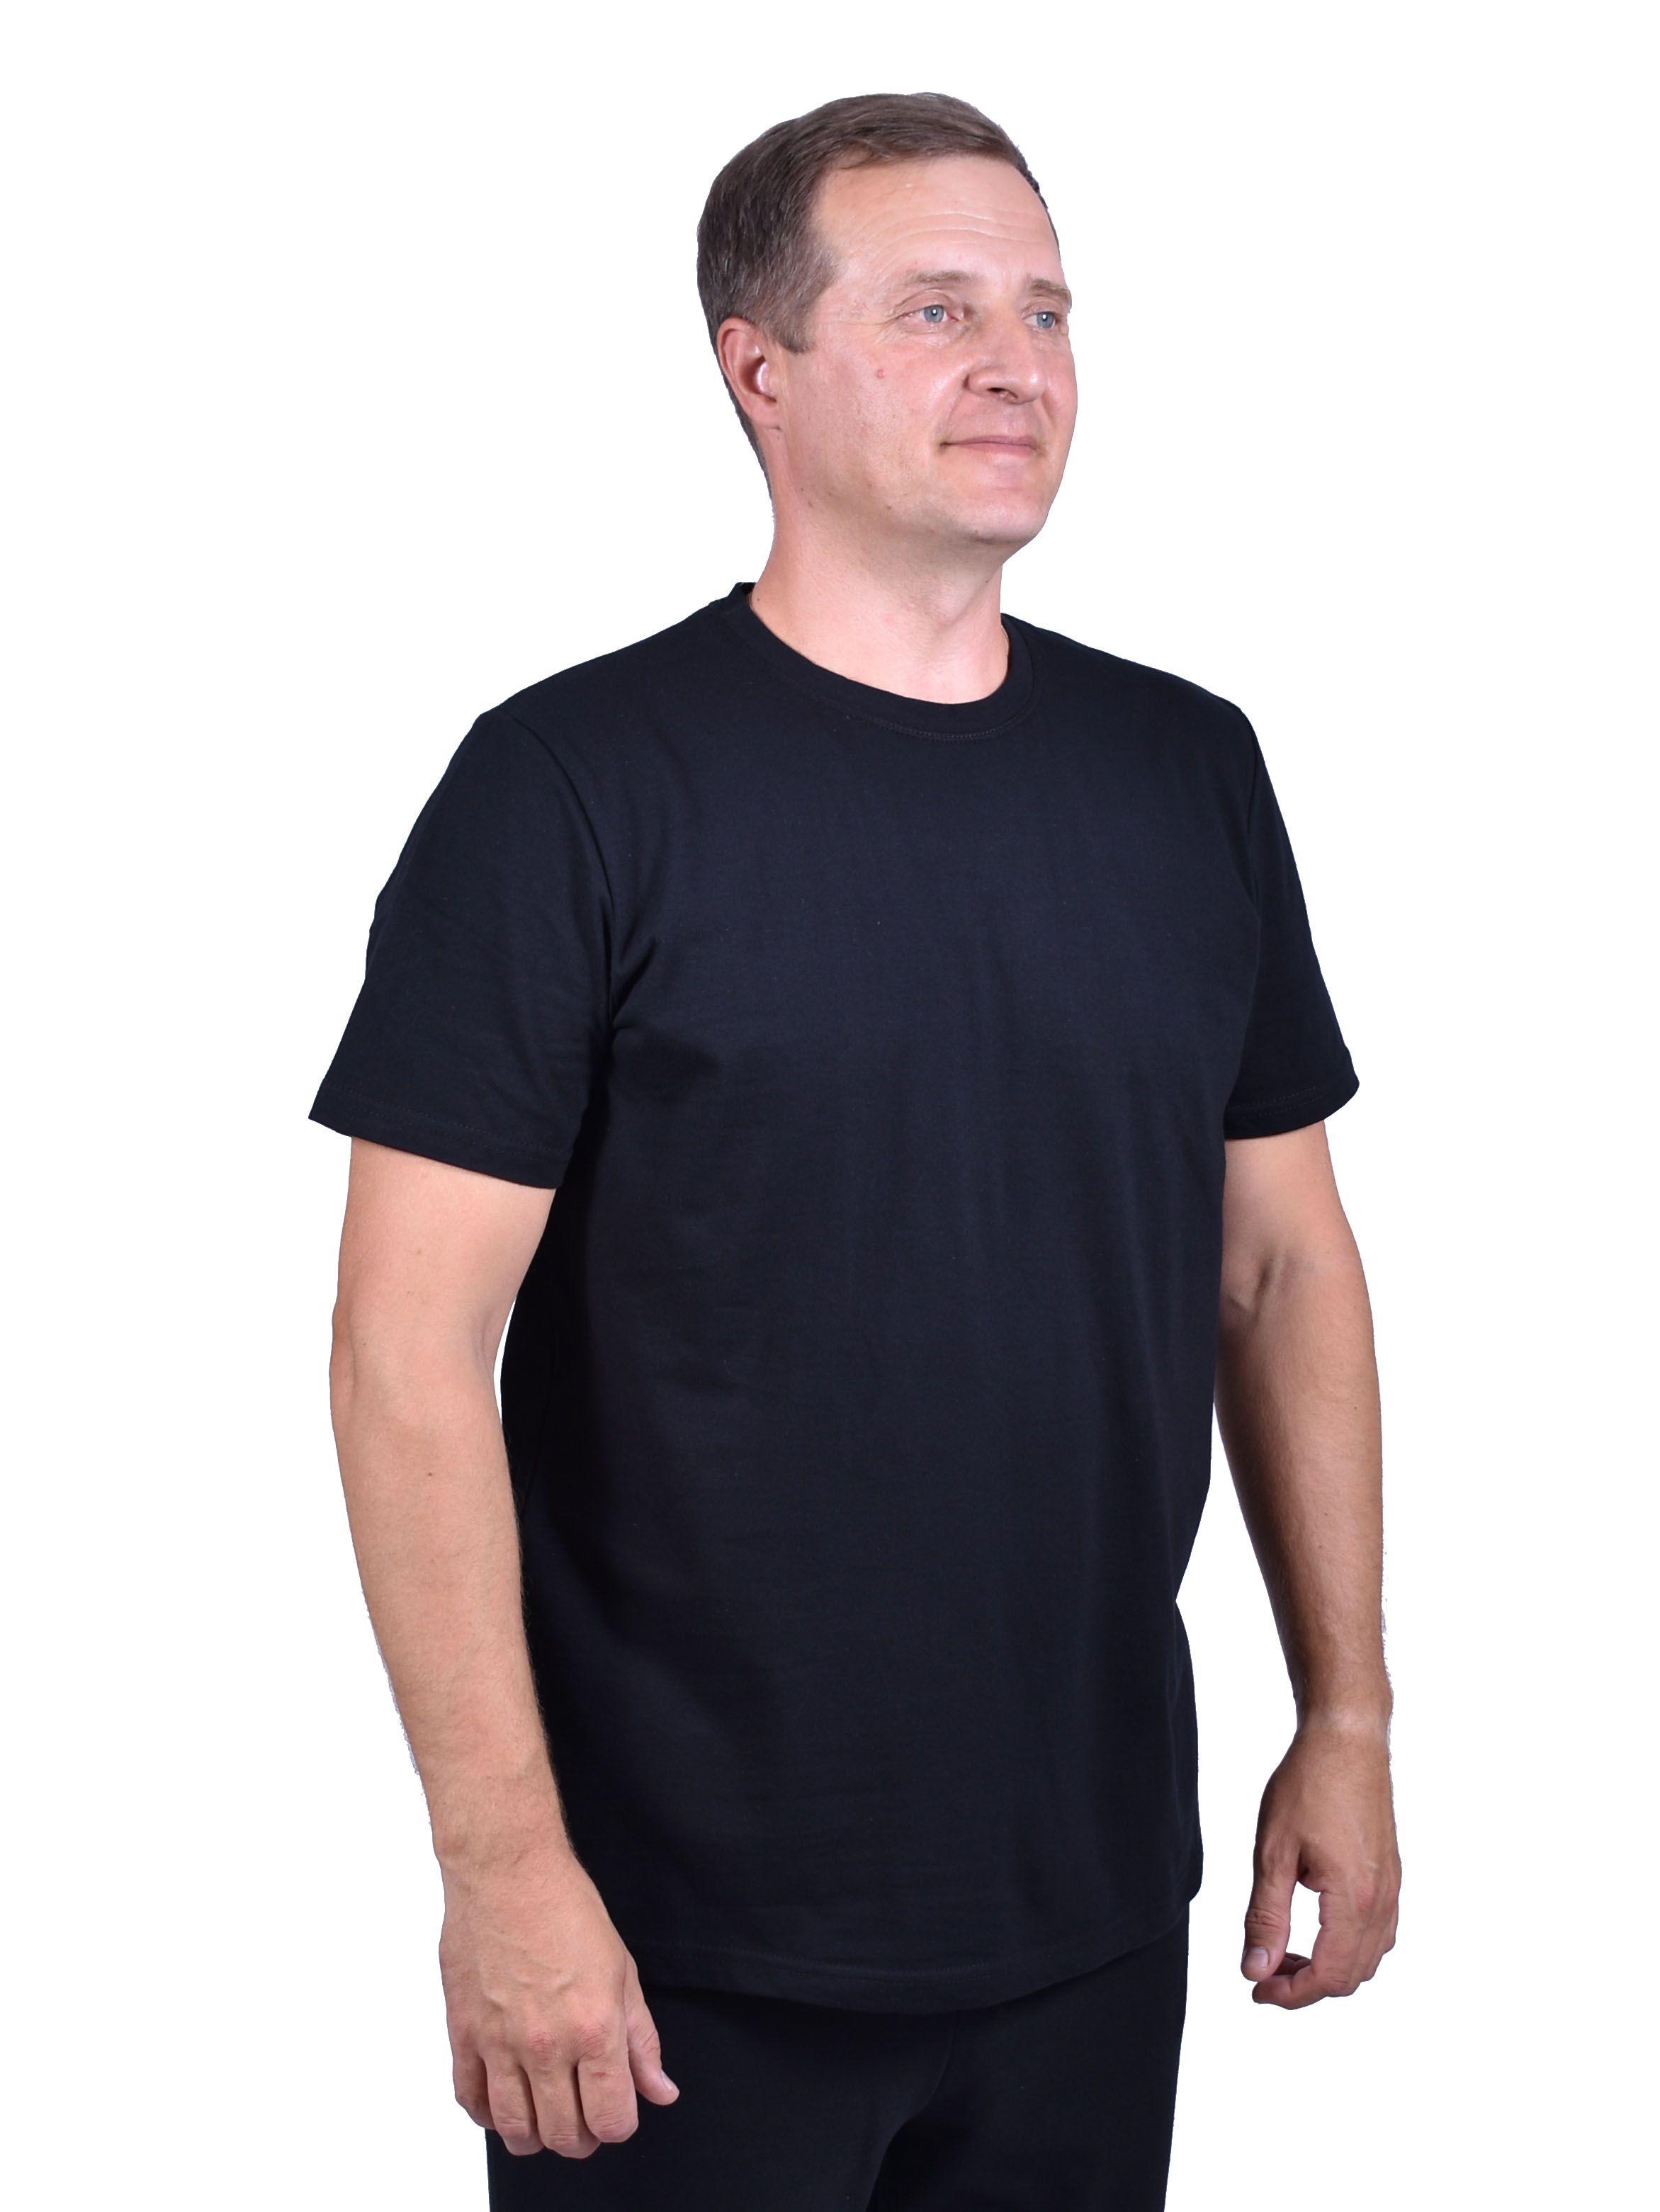 M1-053 Men's T-shirt